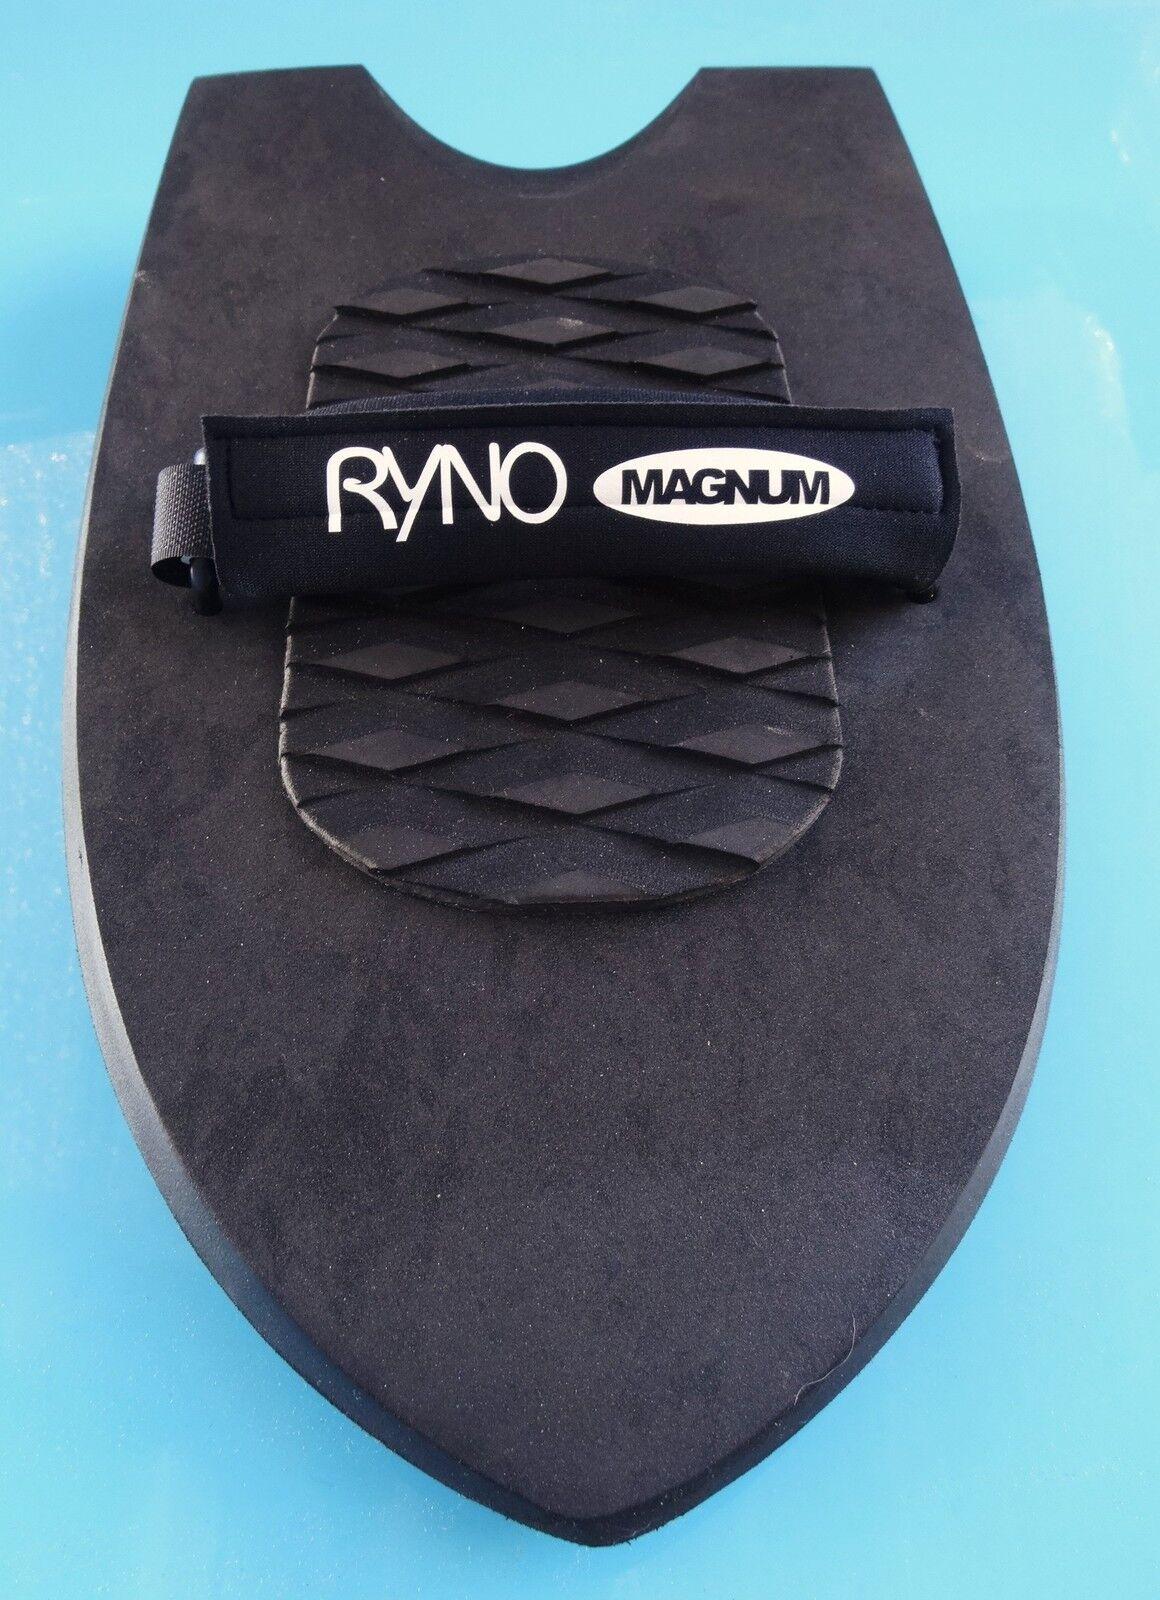 RYNO MAGNUM twin fins handplane handboard bodysurfer board with free wrist leash